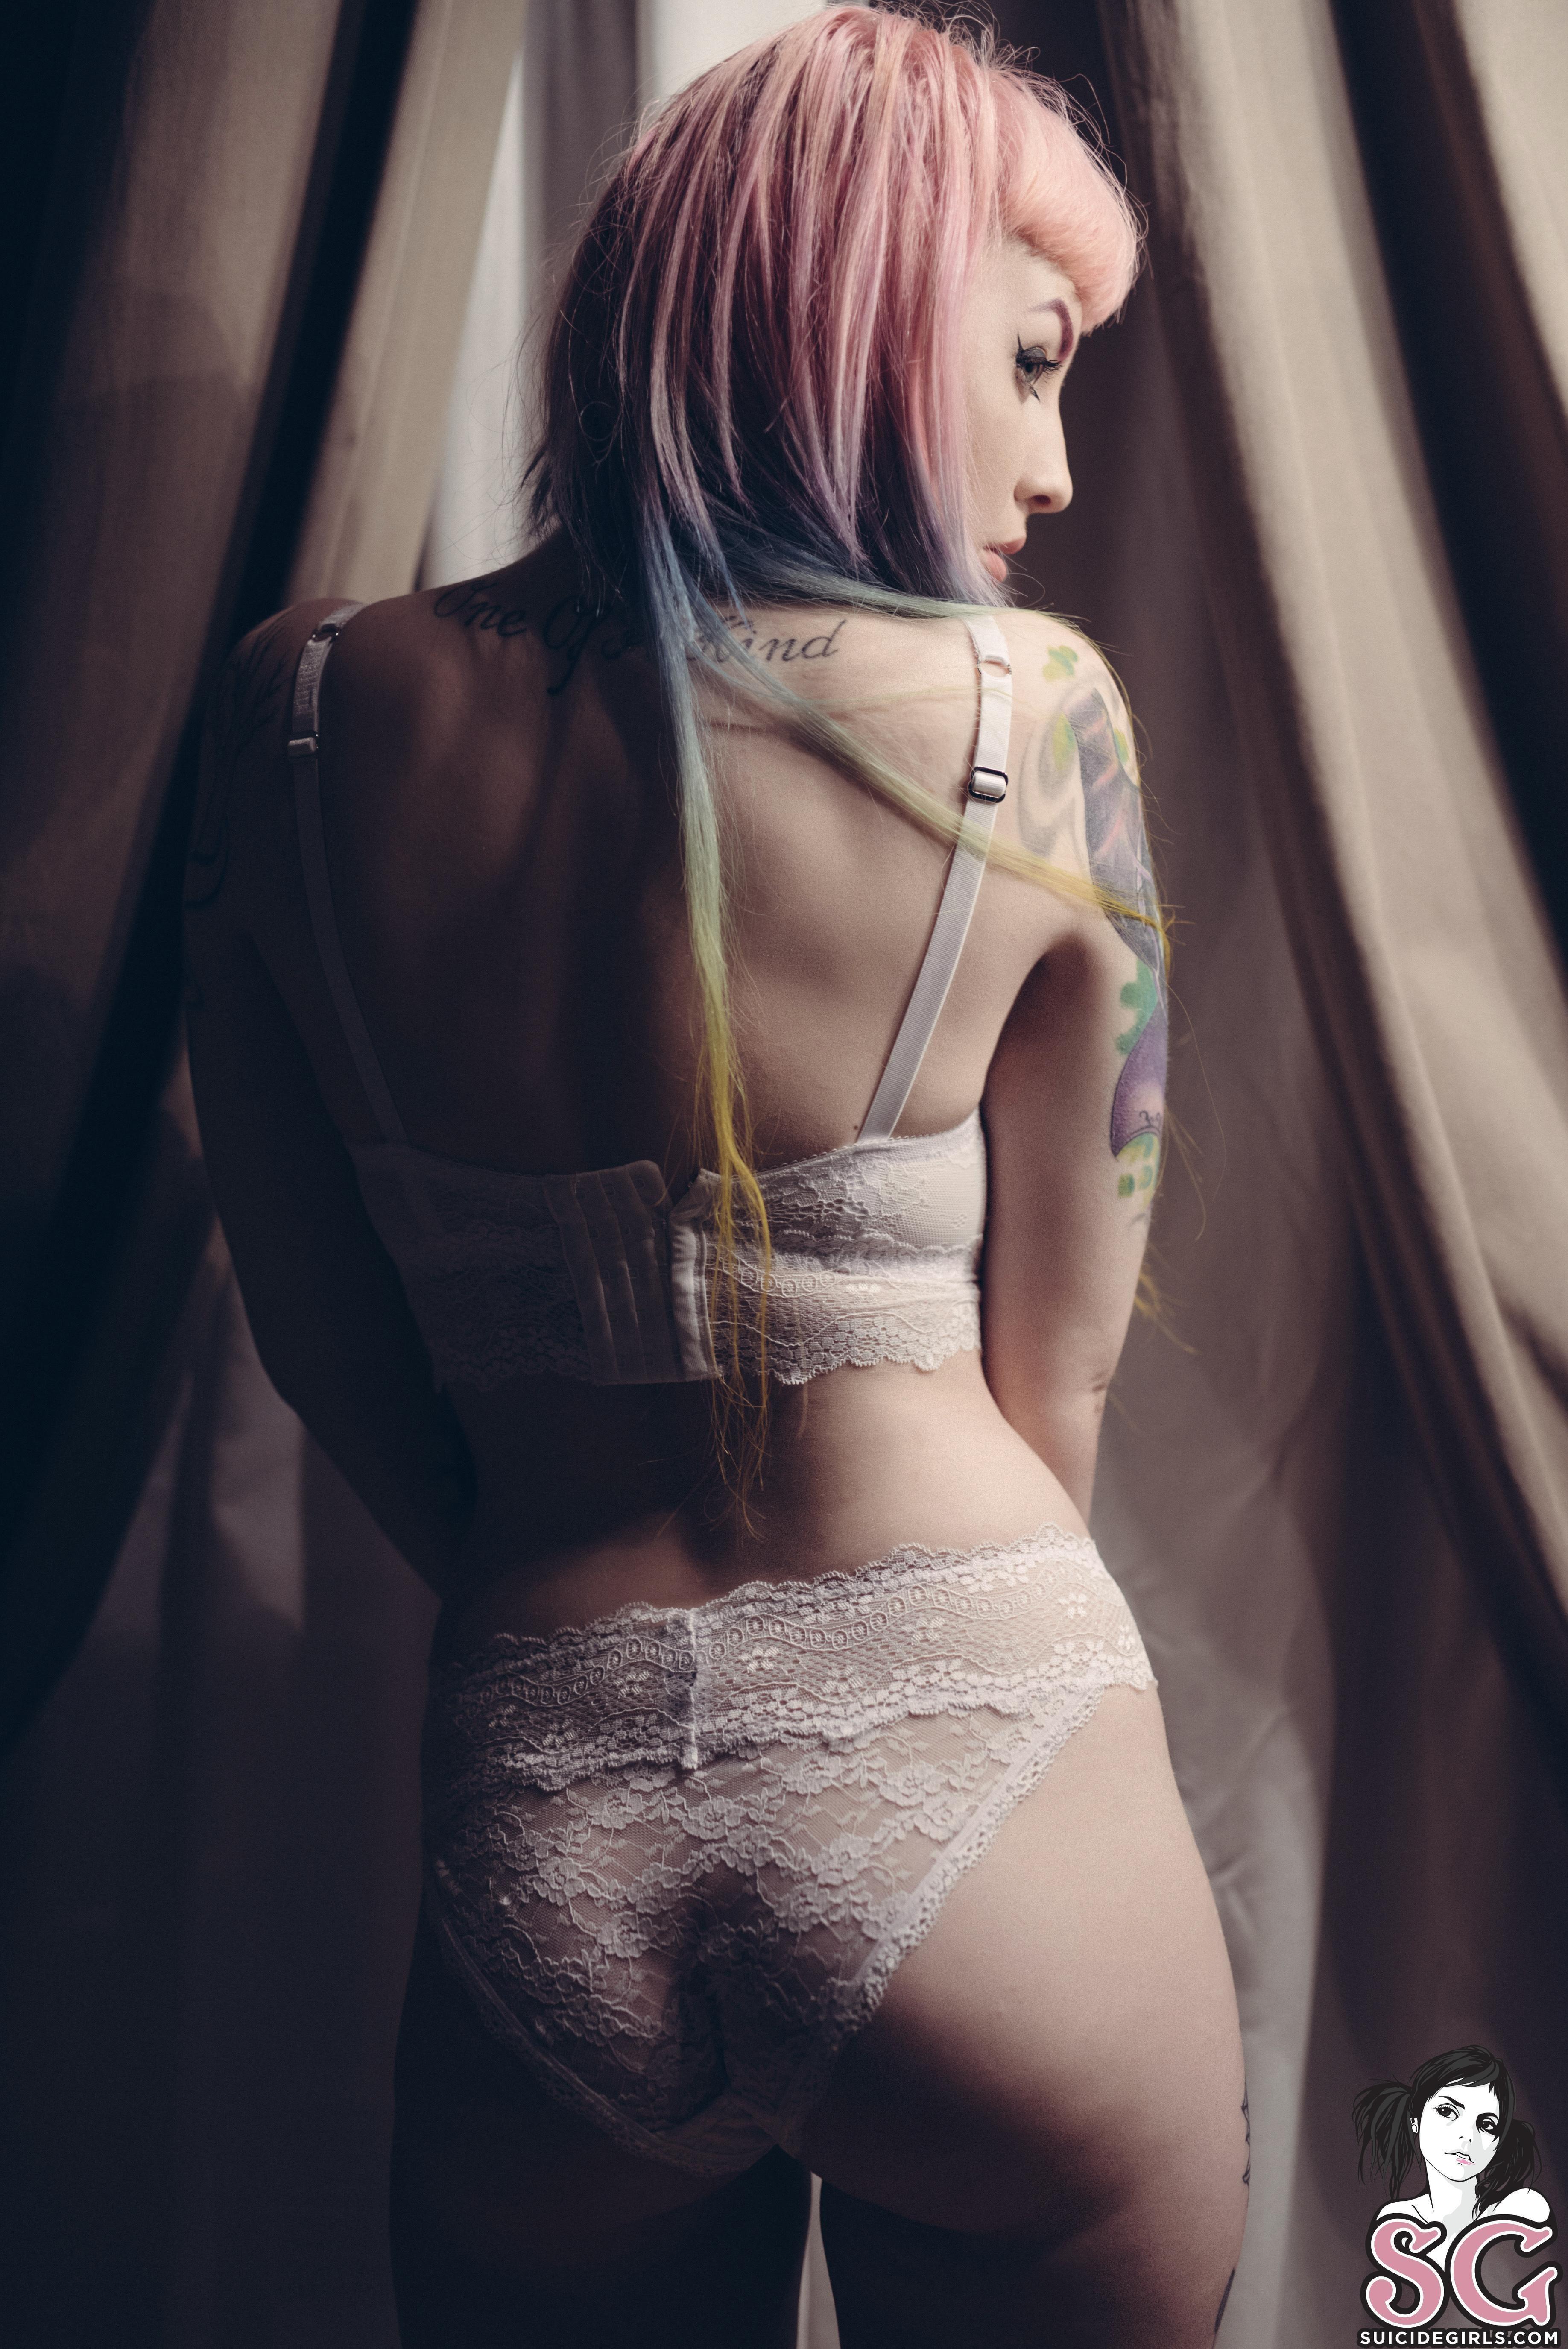 Hot undead girl tube erotic scenes